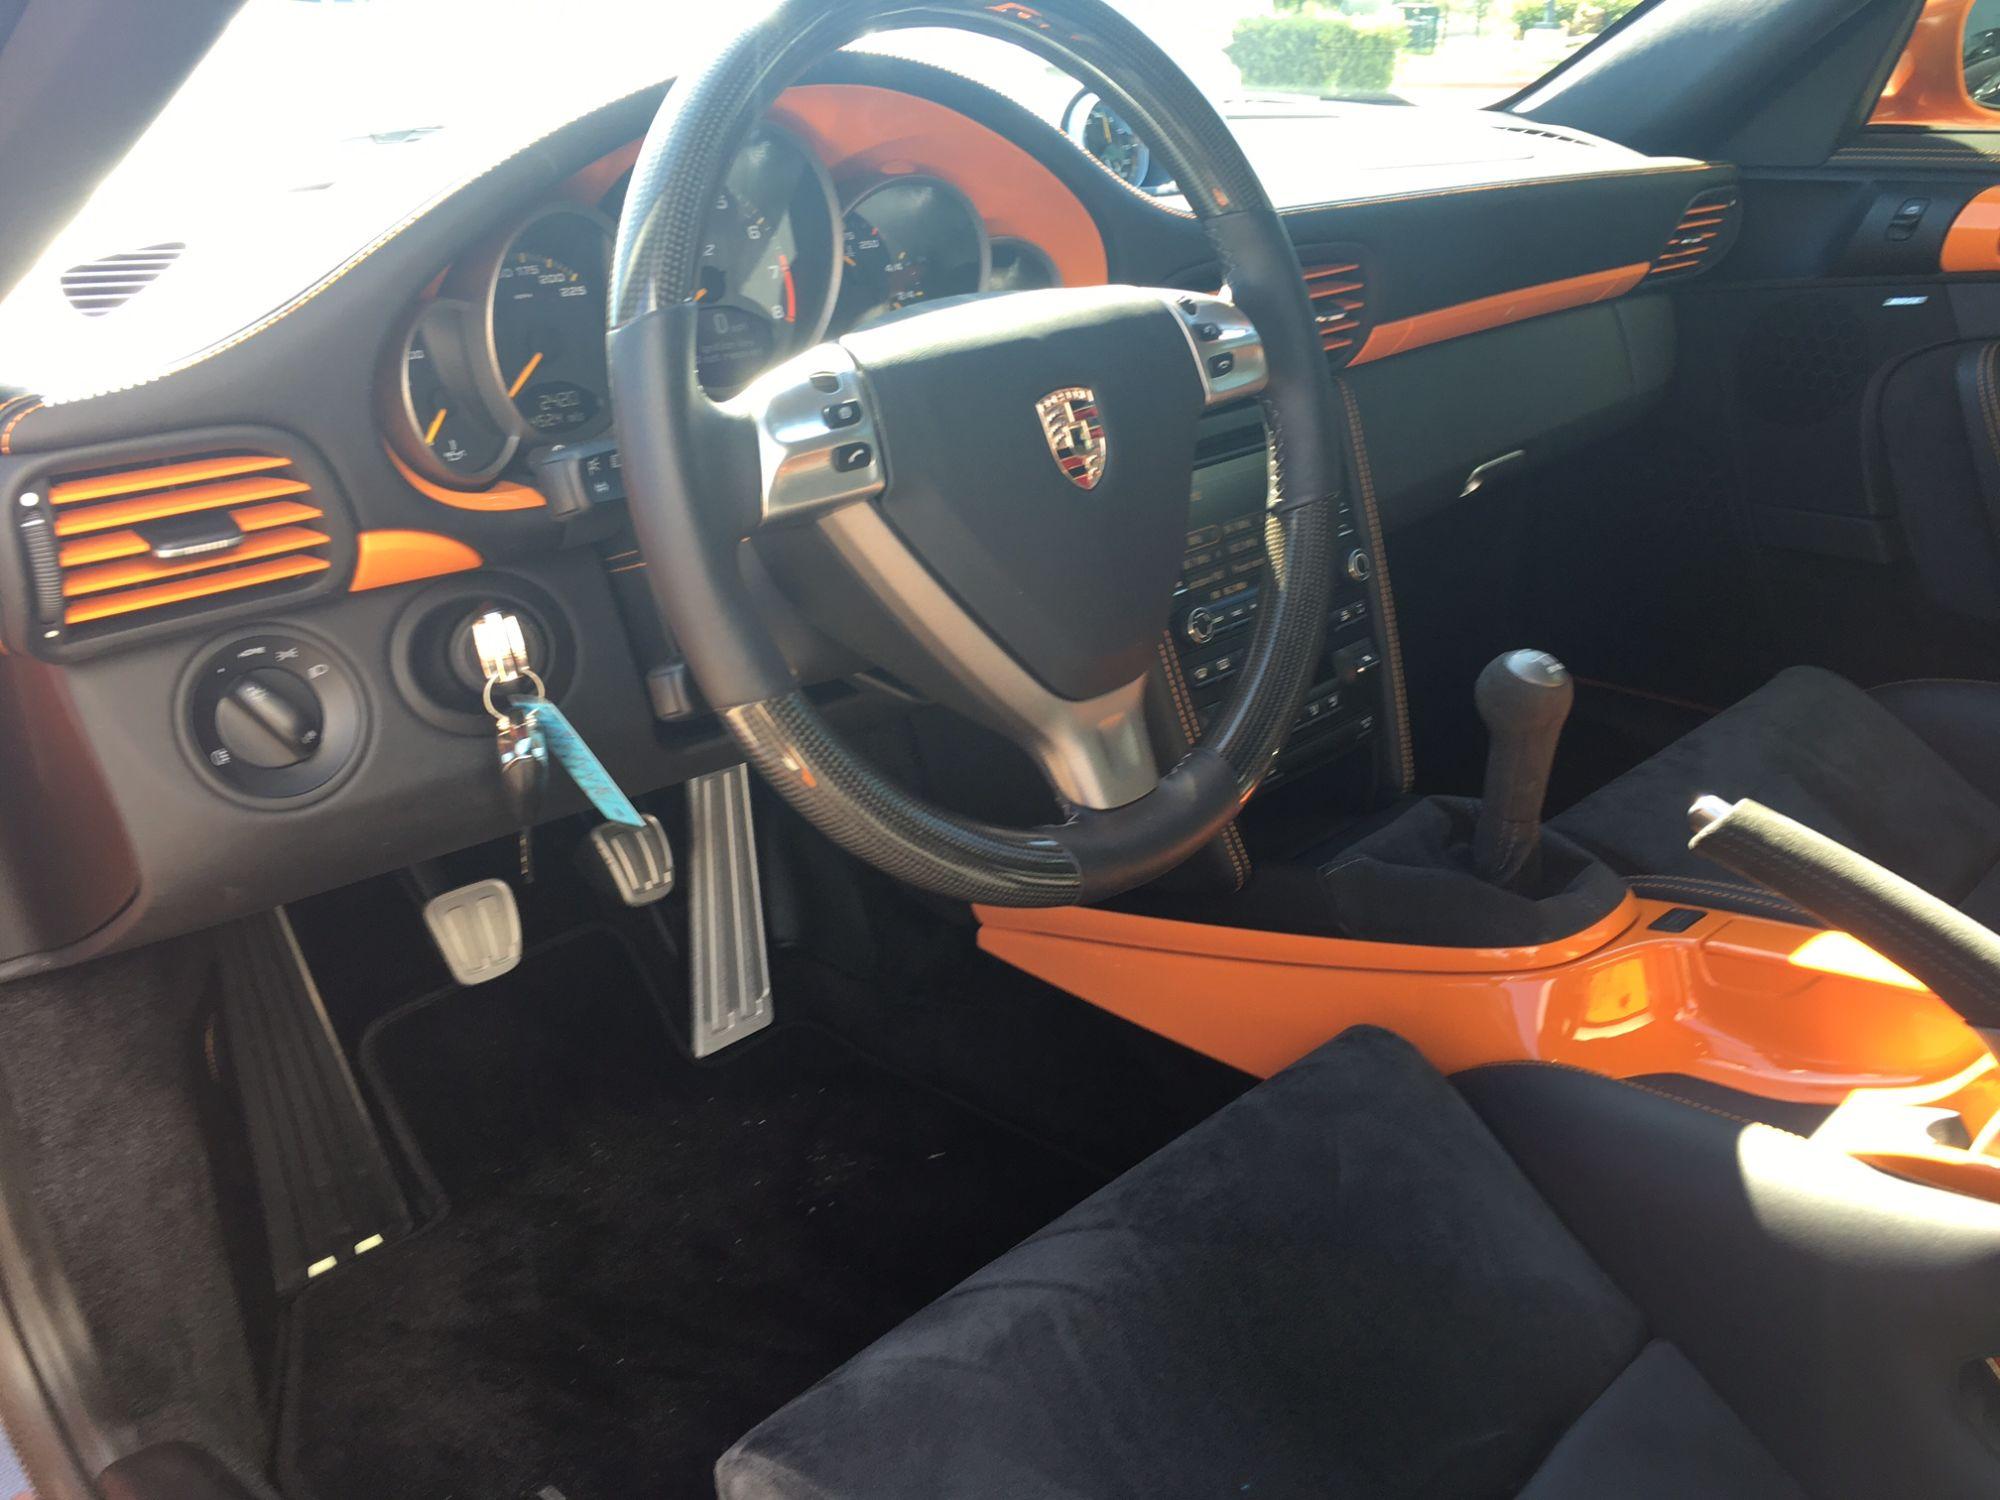 2009-porsche-911-gt2-in-pts-orange-for-sale-at-410000_28 Wonderful Porsche 911 Gt2 Wheel for Sale Cars Trend